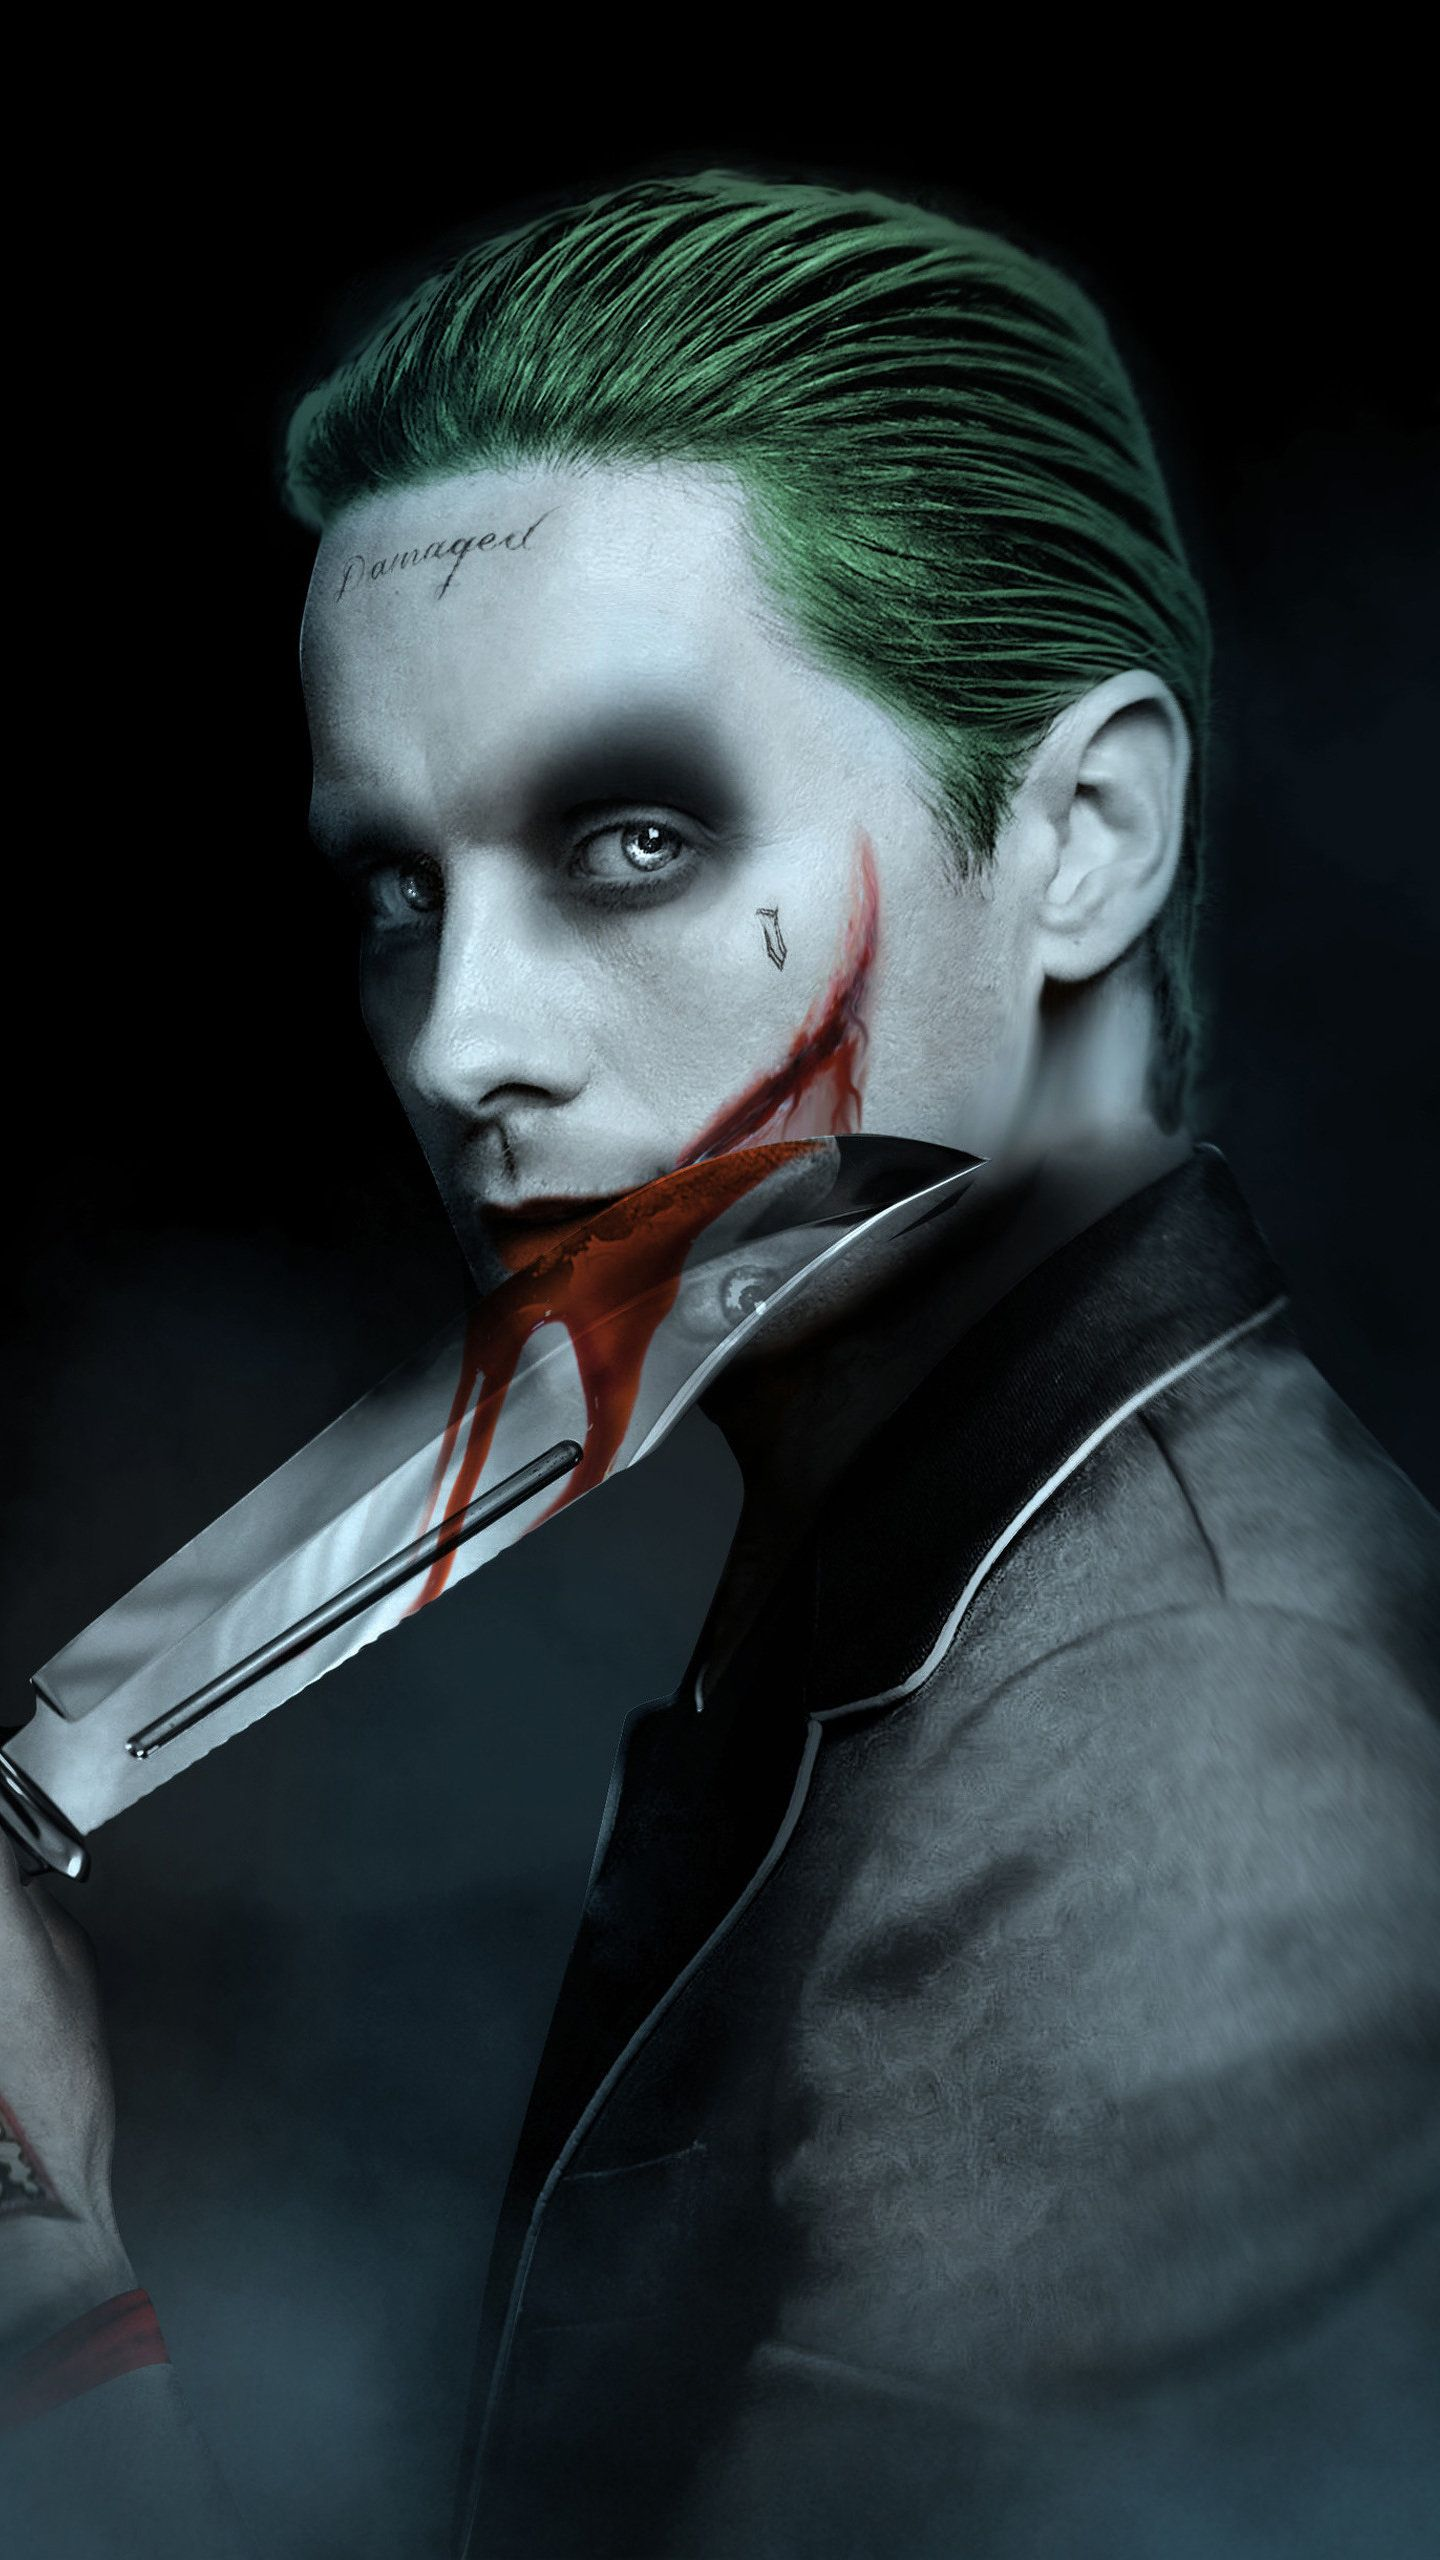 Jared Leto Joker Artwork Hd Superheroes Wallpapers Photos And